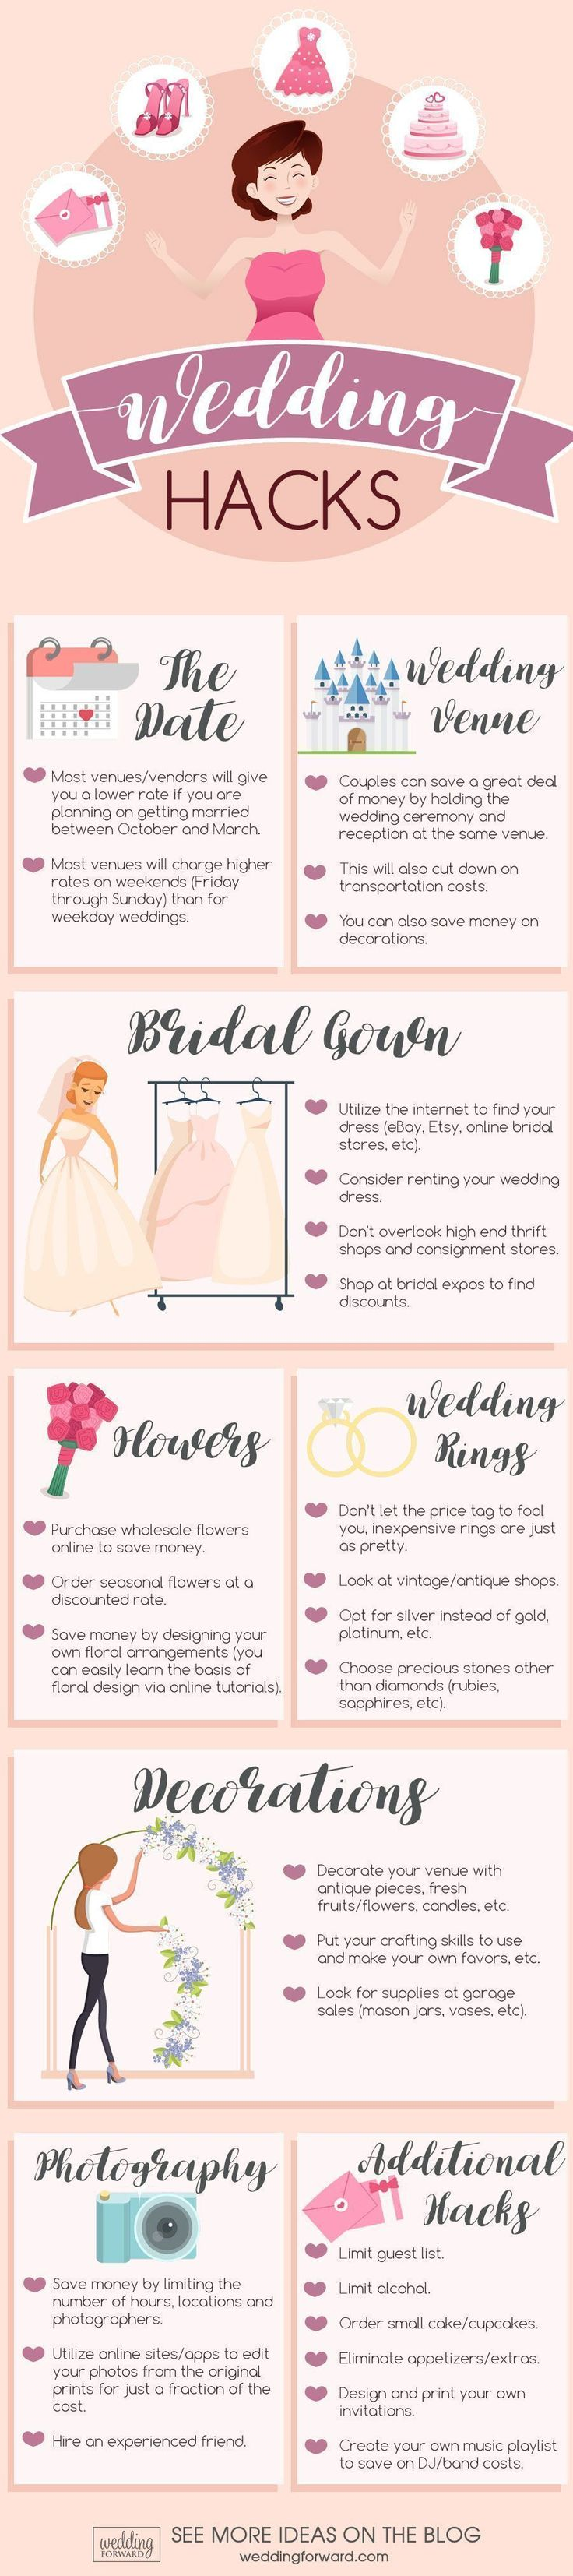 Design your own wedding dress cheap   best Wedding Plans images on Pinterest  Barn weddings Bridal